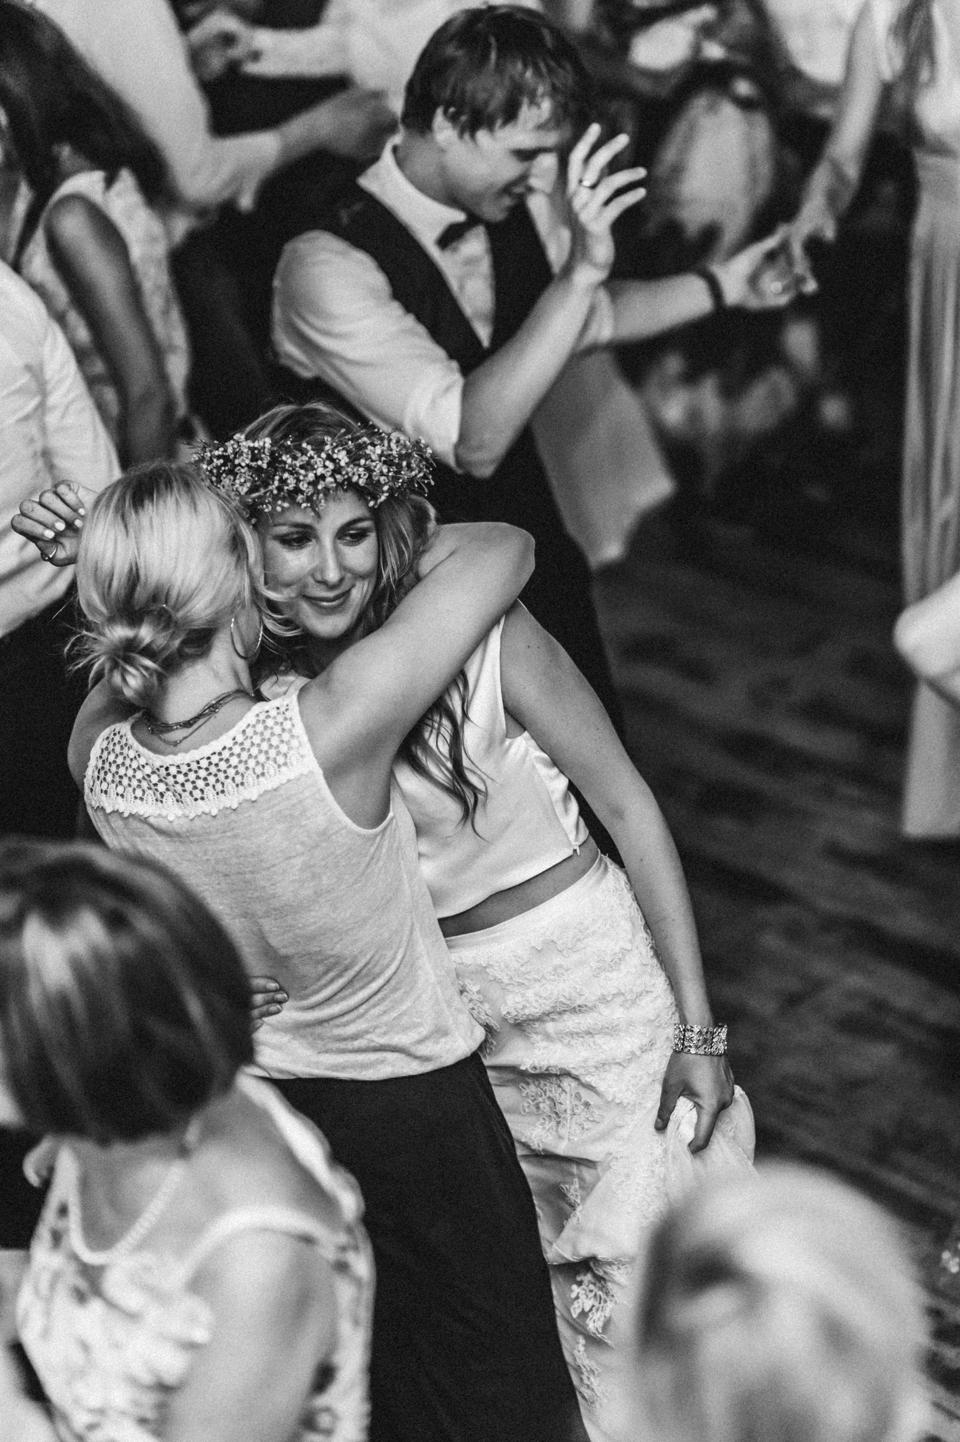 rembostyling-weddinginspiration-kreativ-wedding-wedding-belin-loft23_0408